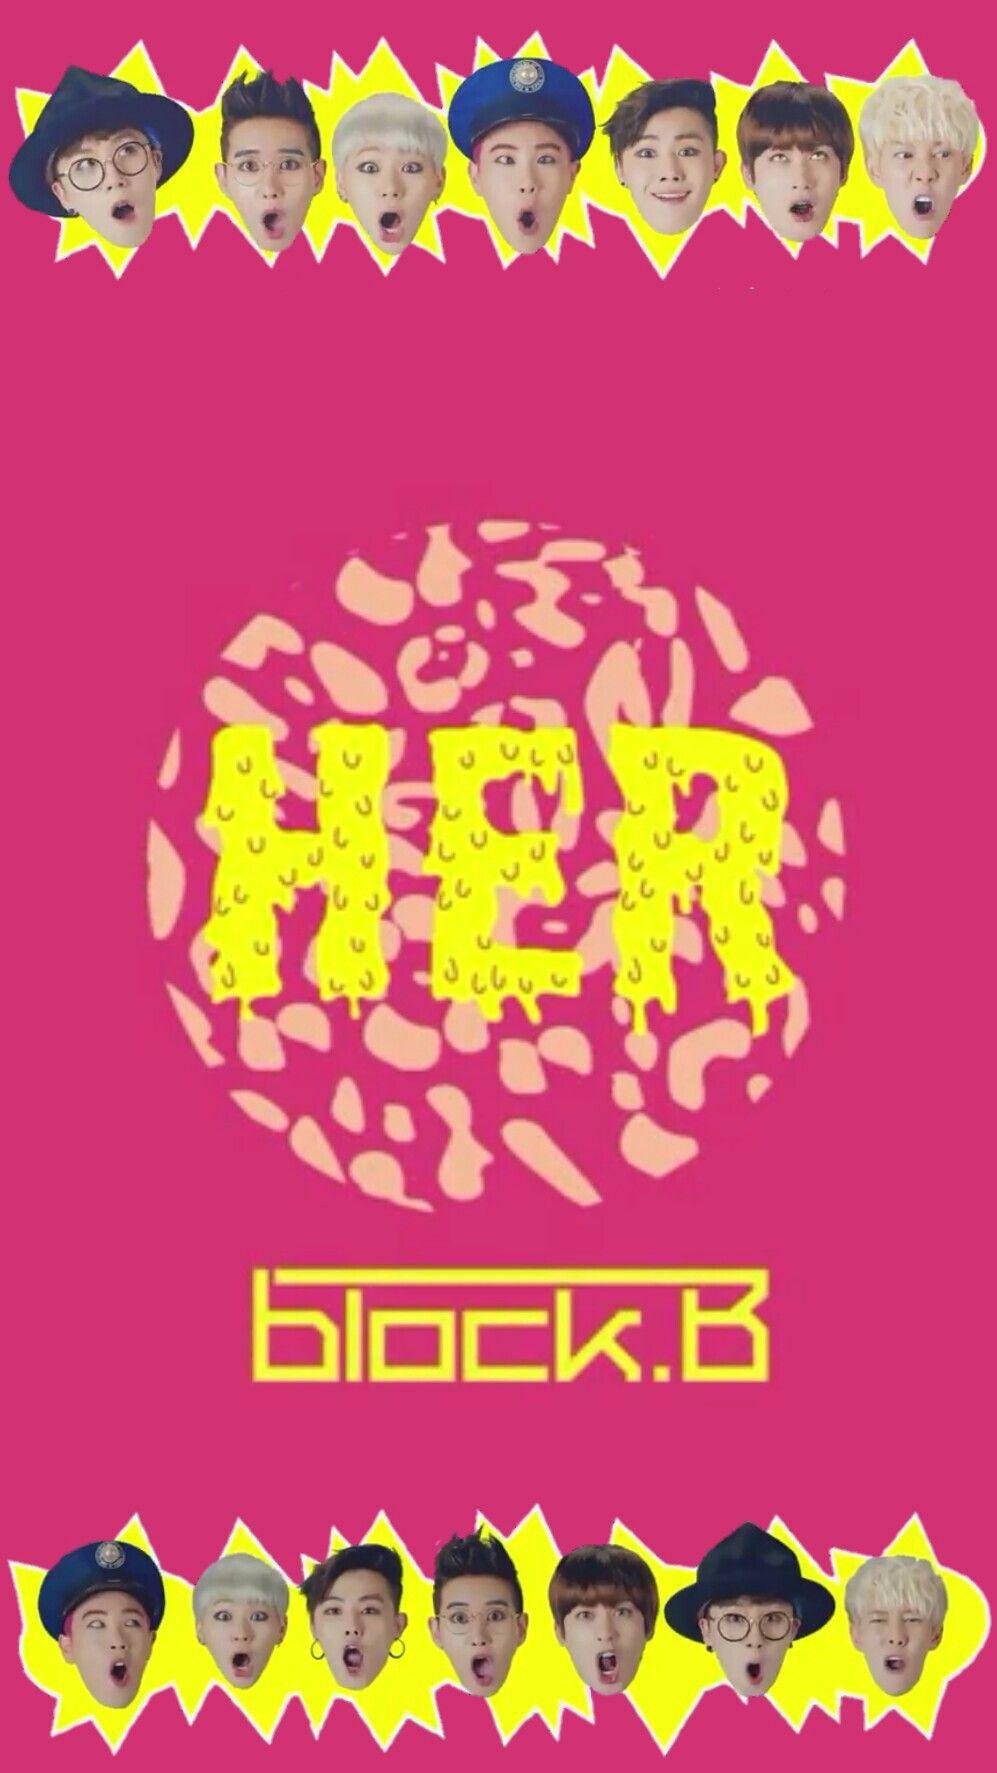 Block B Is One Of My Favorite Groups Blockb Her Kpo